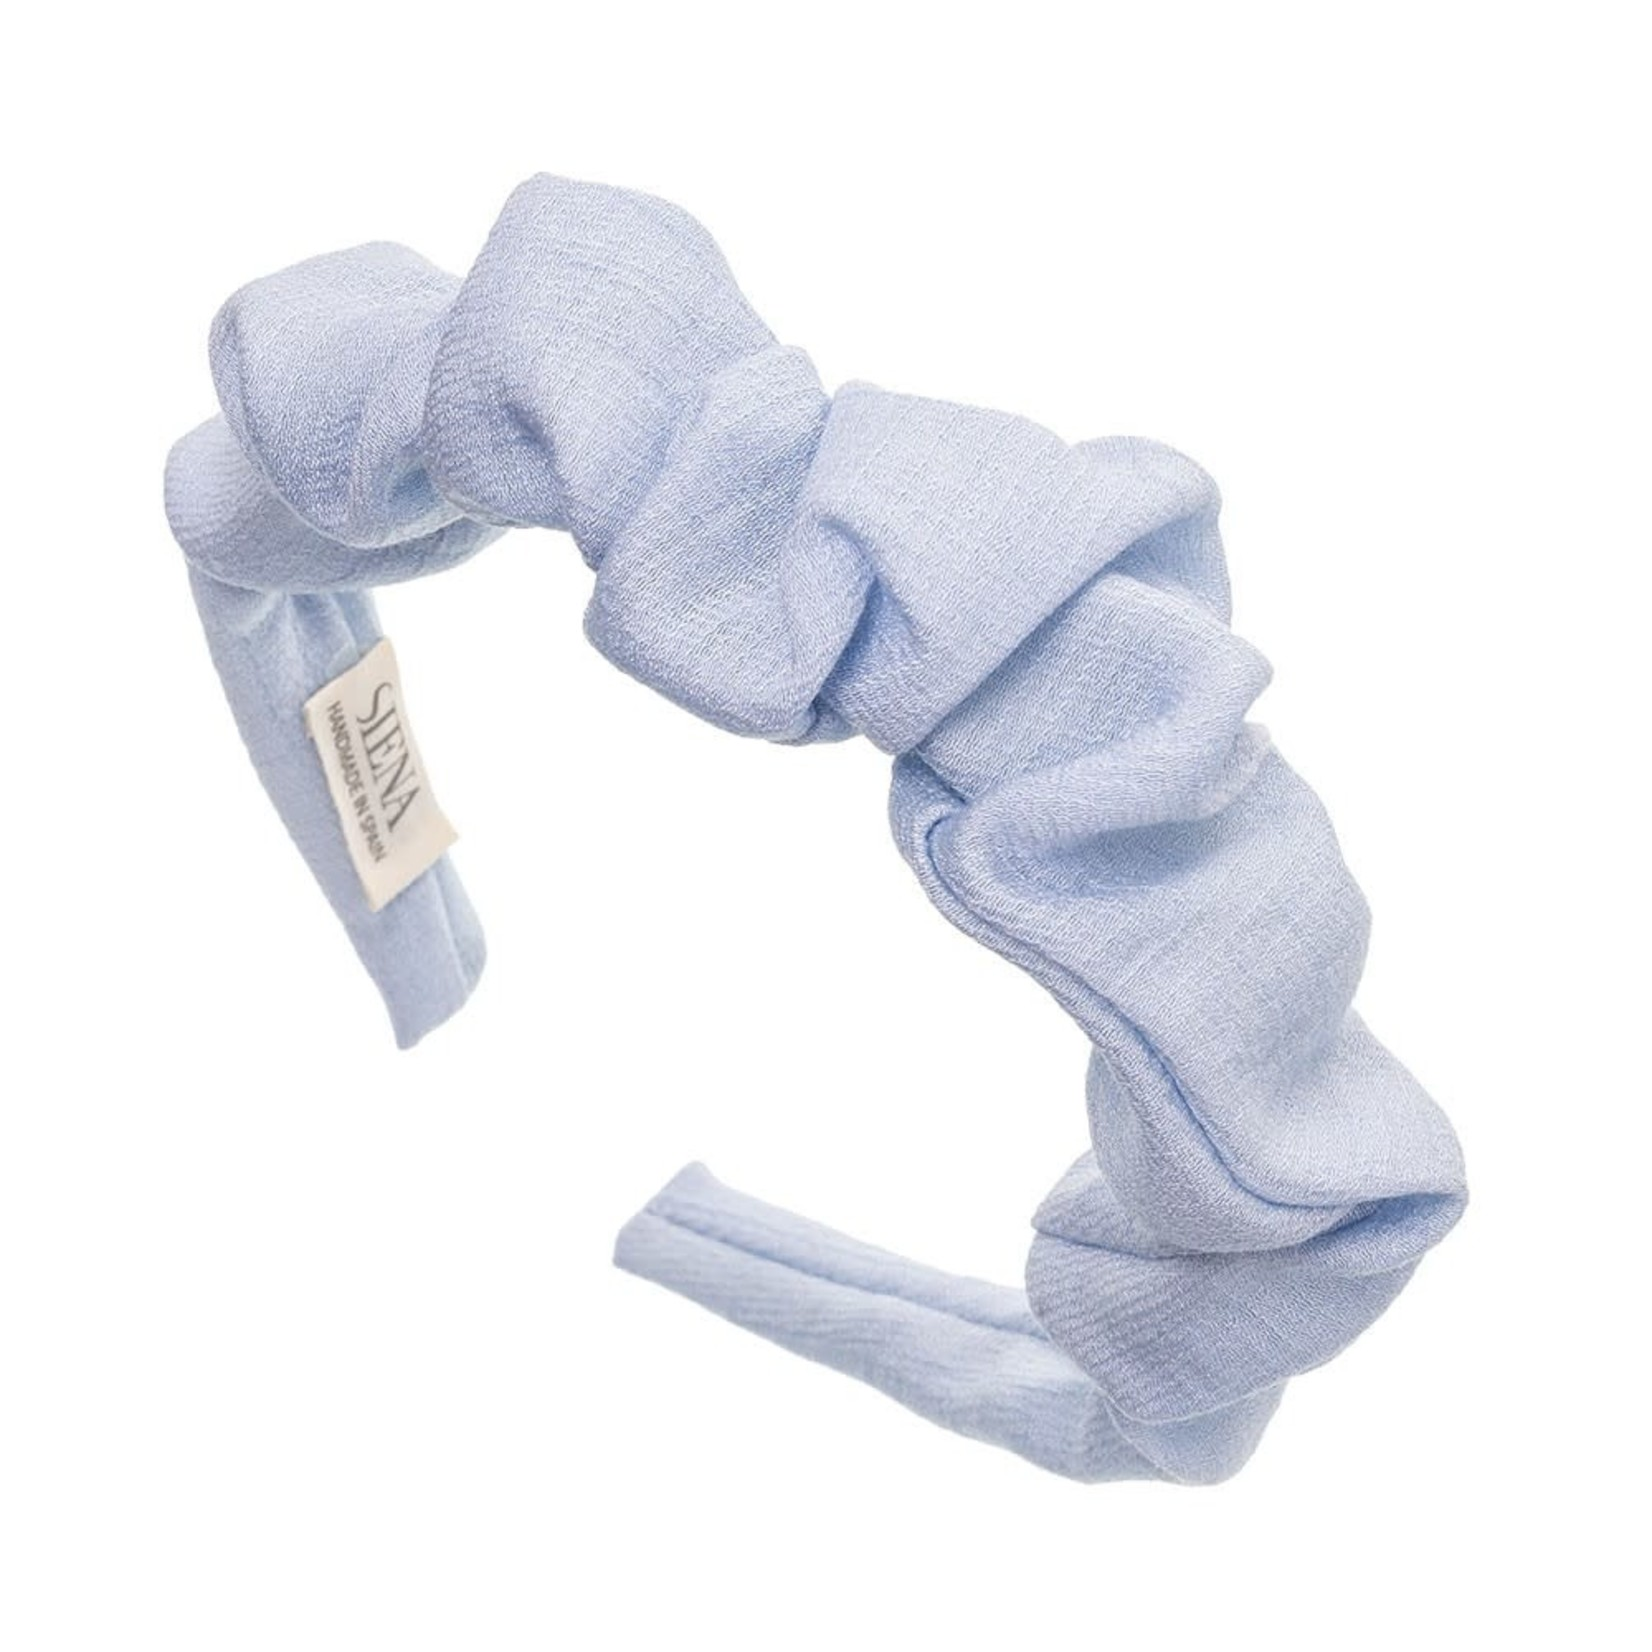 Siena Hairband Scrunchie - Pale Blue